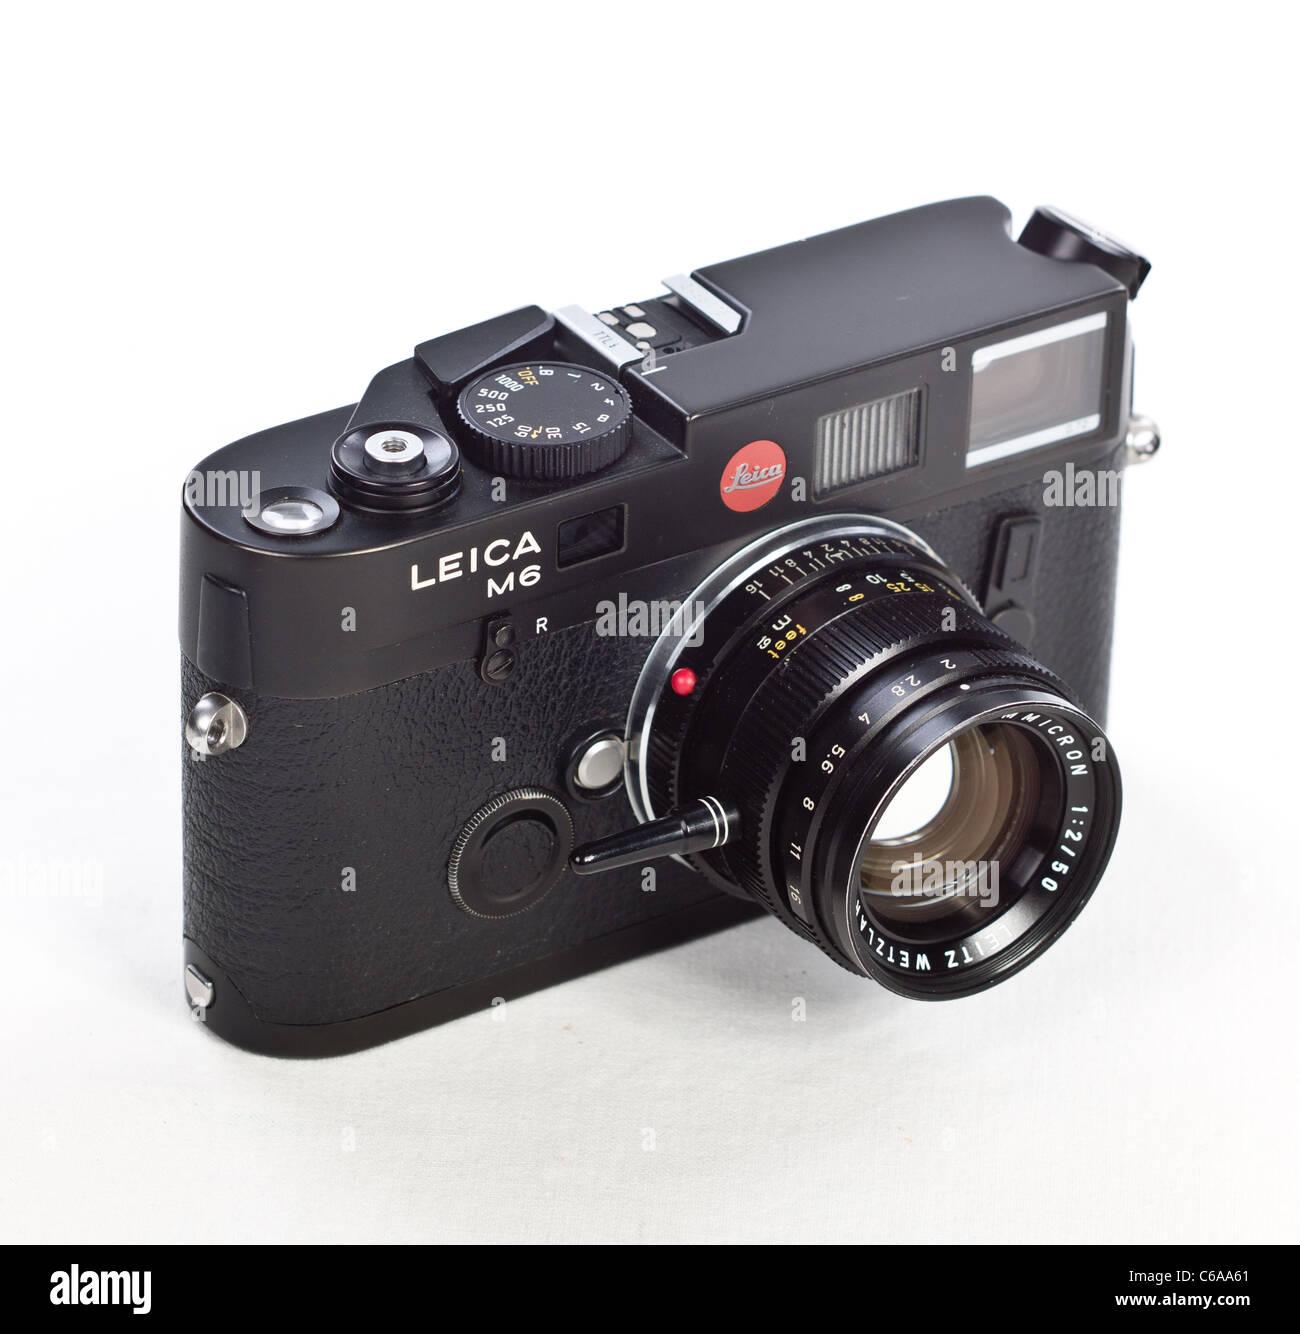 dbd3f7b6aec9 Leica M6 TTL Entfernungsmesser RF 35mm Filmkamera mit Classic 50mm  Summicron f2 Objektiv schwarz